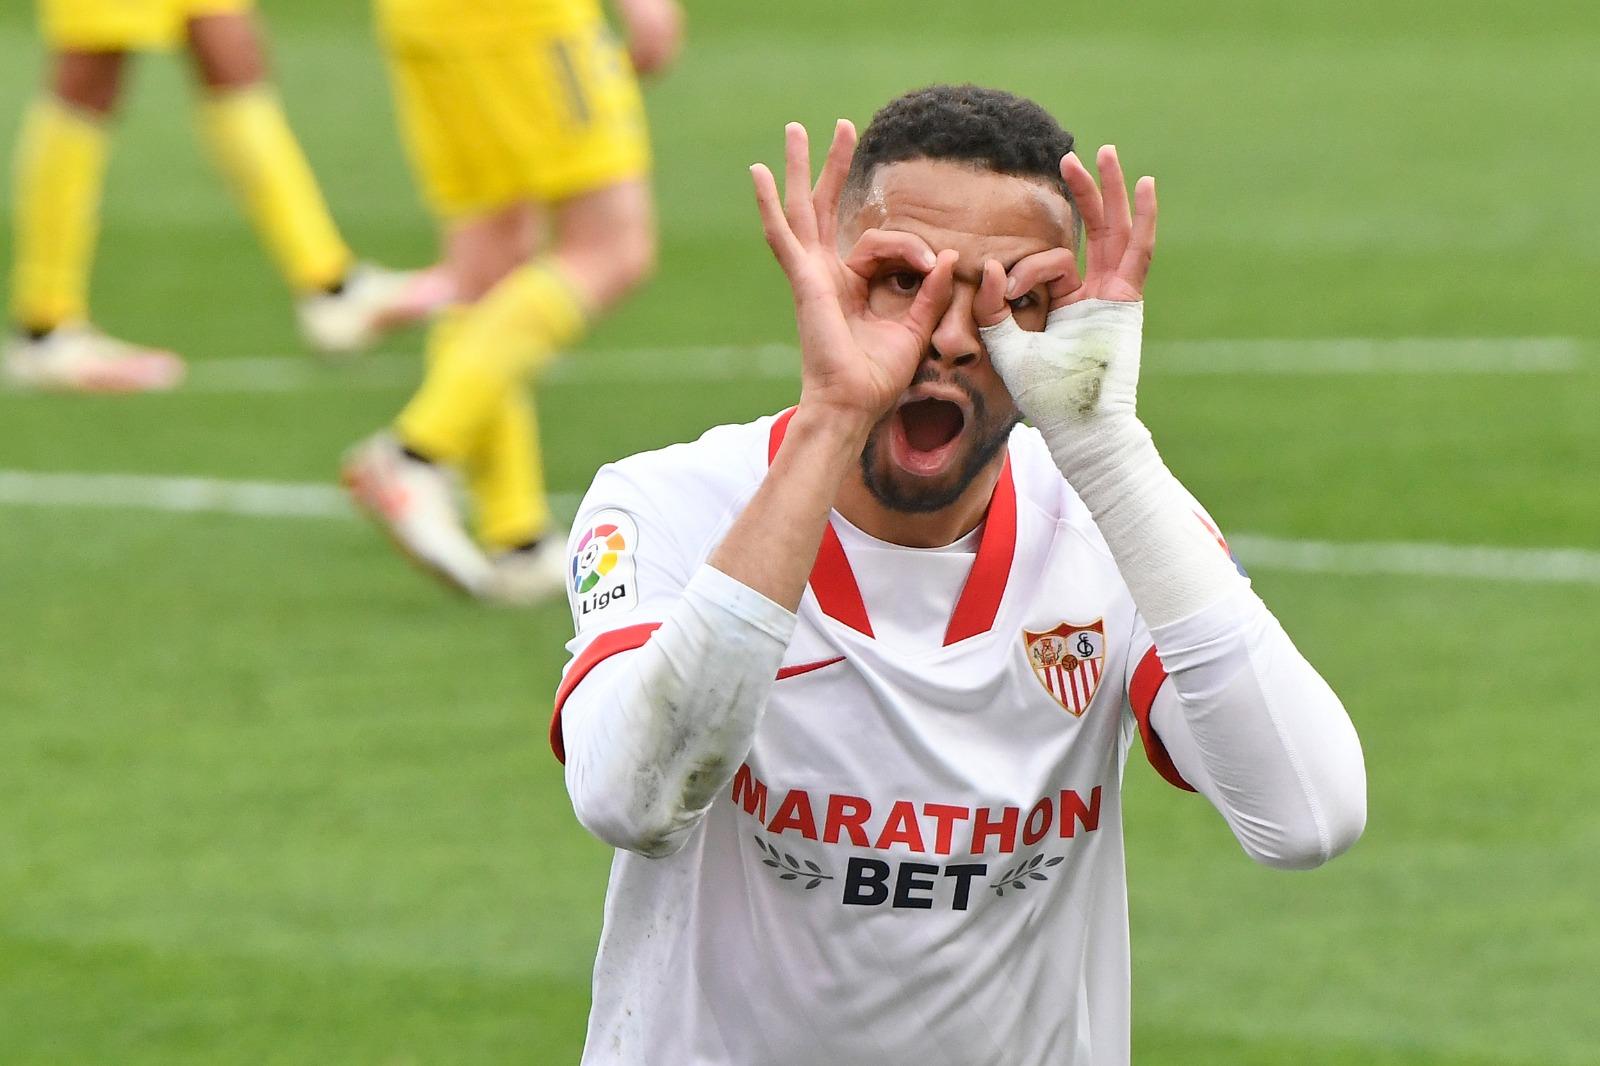 Done deal: Sevilla sign Leganes striker Youssef En-Nesyri - Football Espana